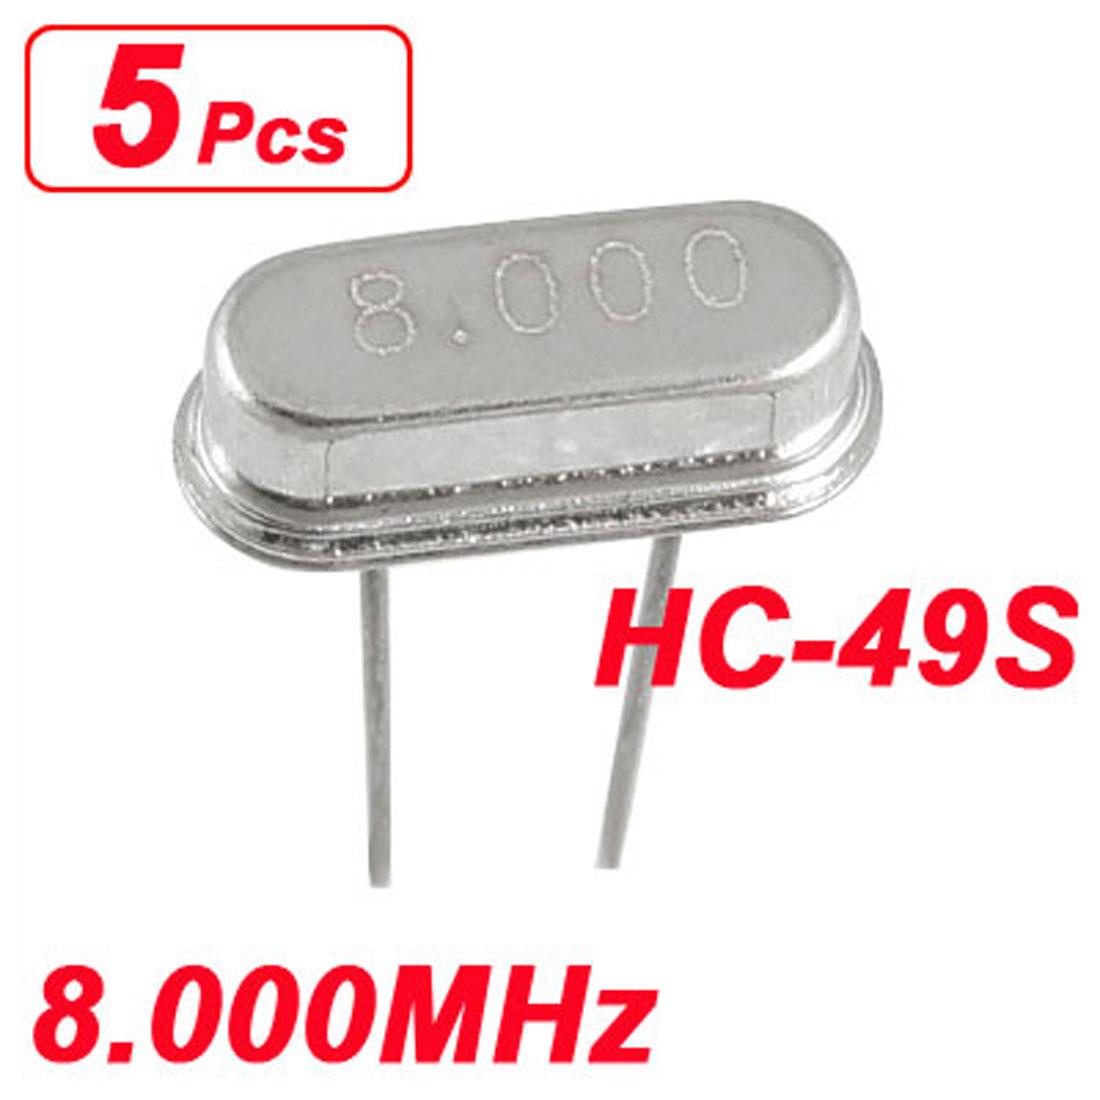 5 x 8.000 MHz 8 MHz Crystal HC-49S DIP Mounting Crystal Oscillator